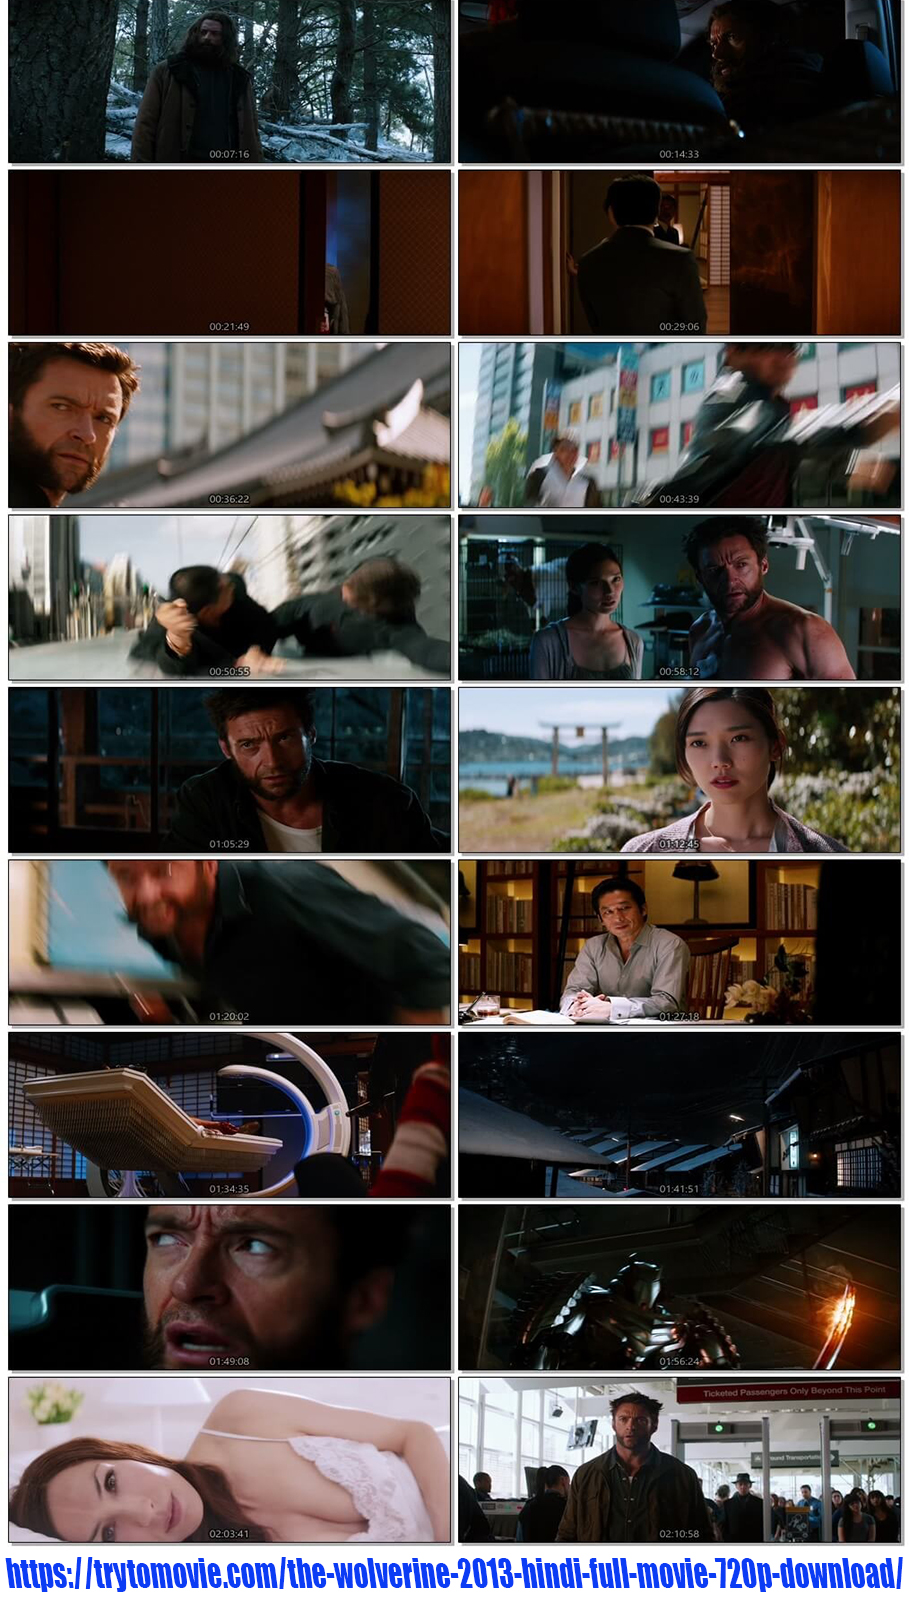 The Wolverine 2013 Hindi Full Movie 720p Download